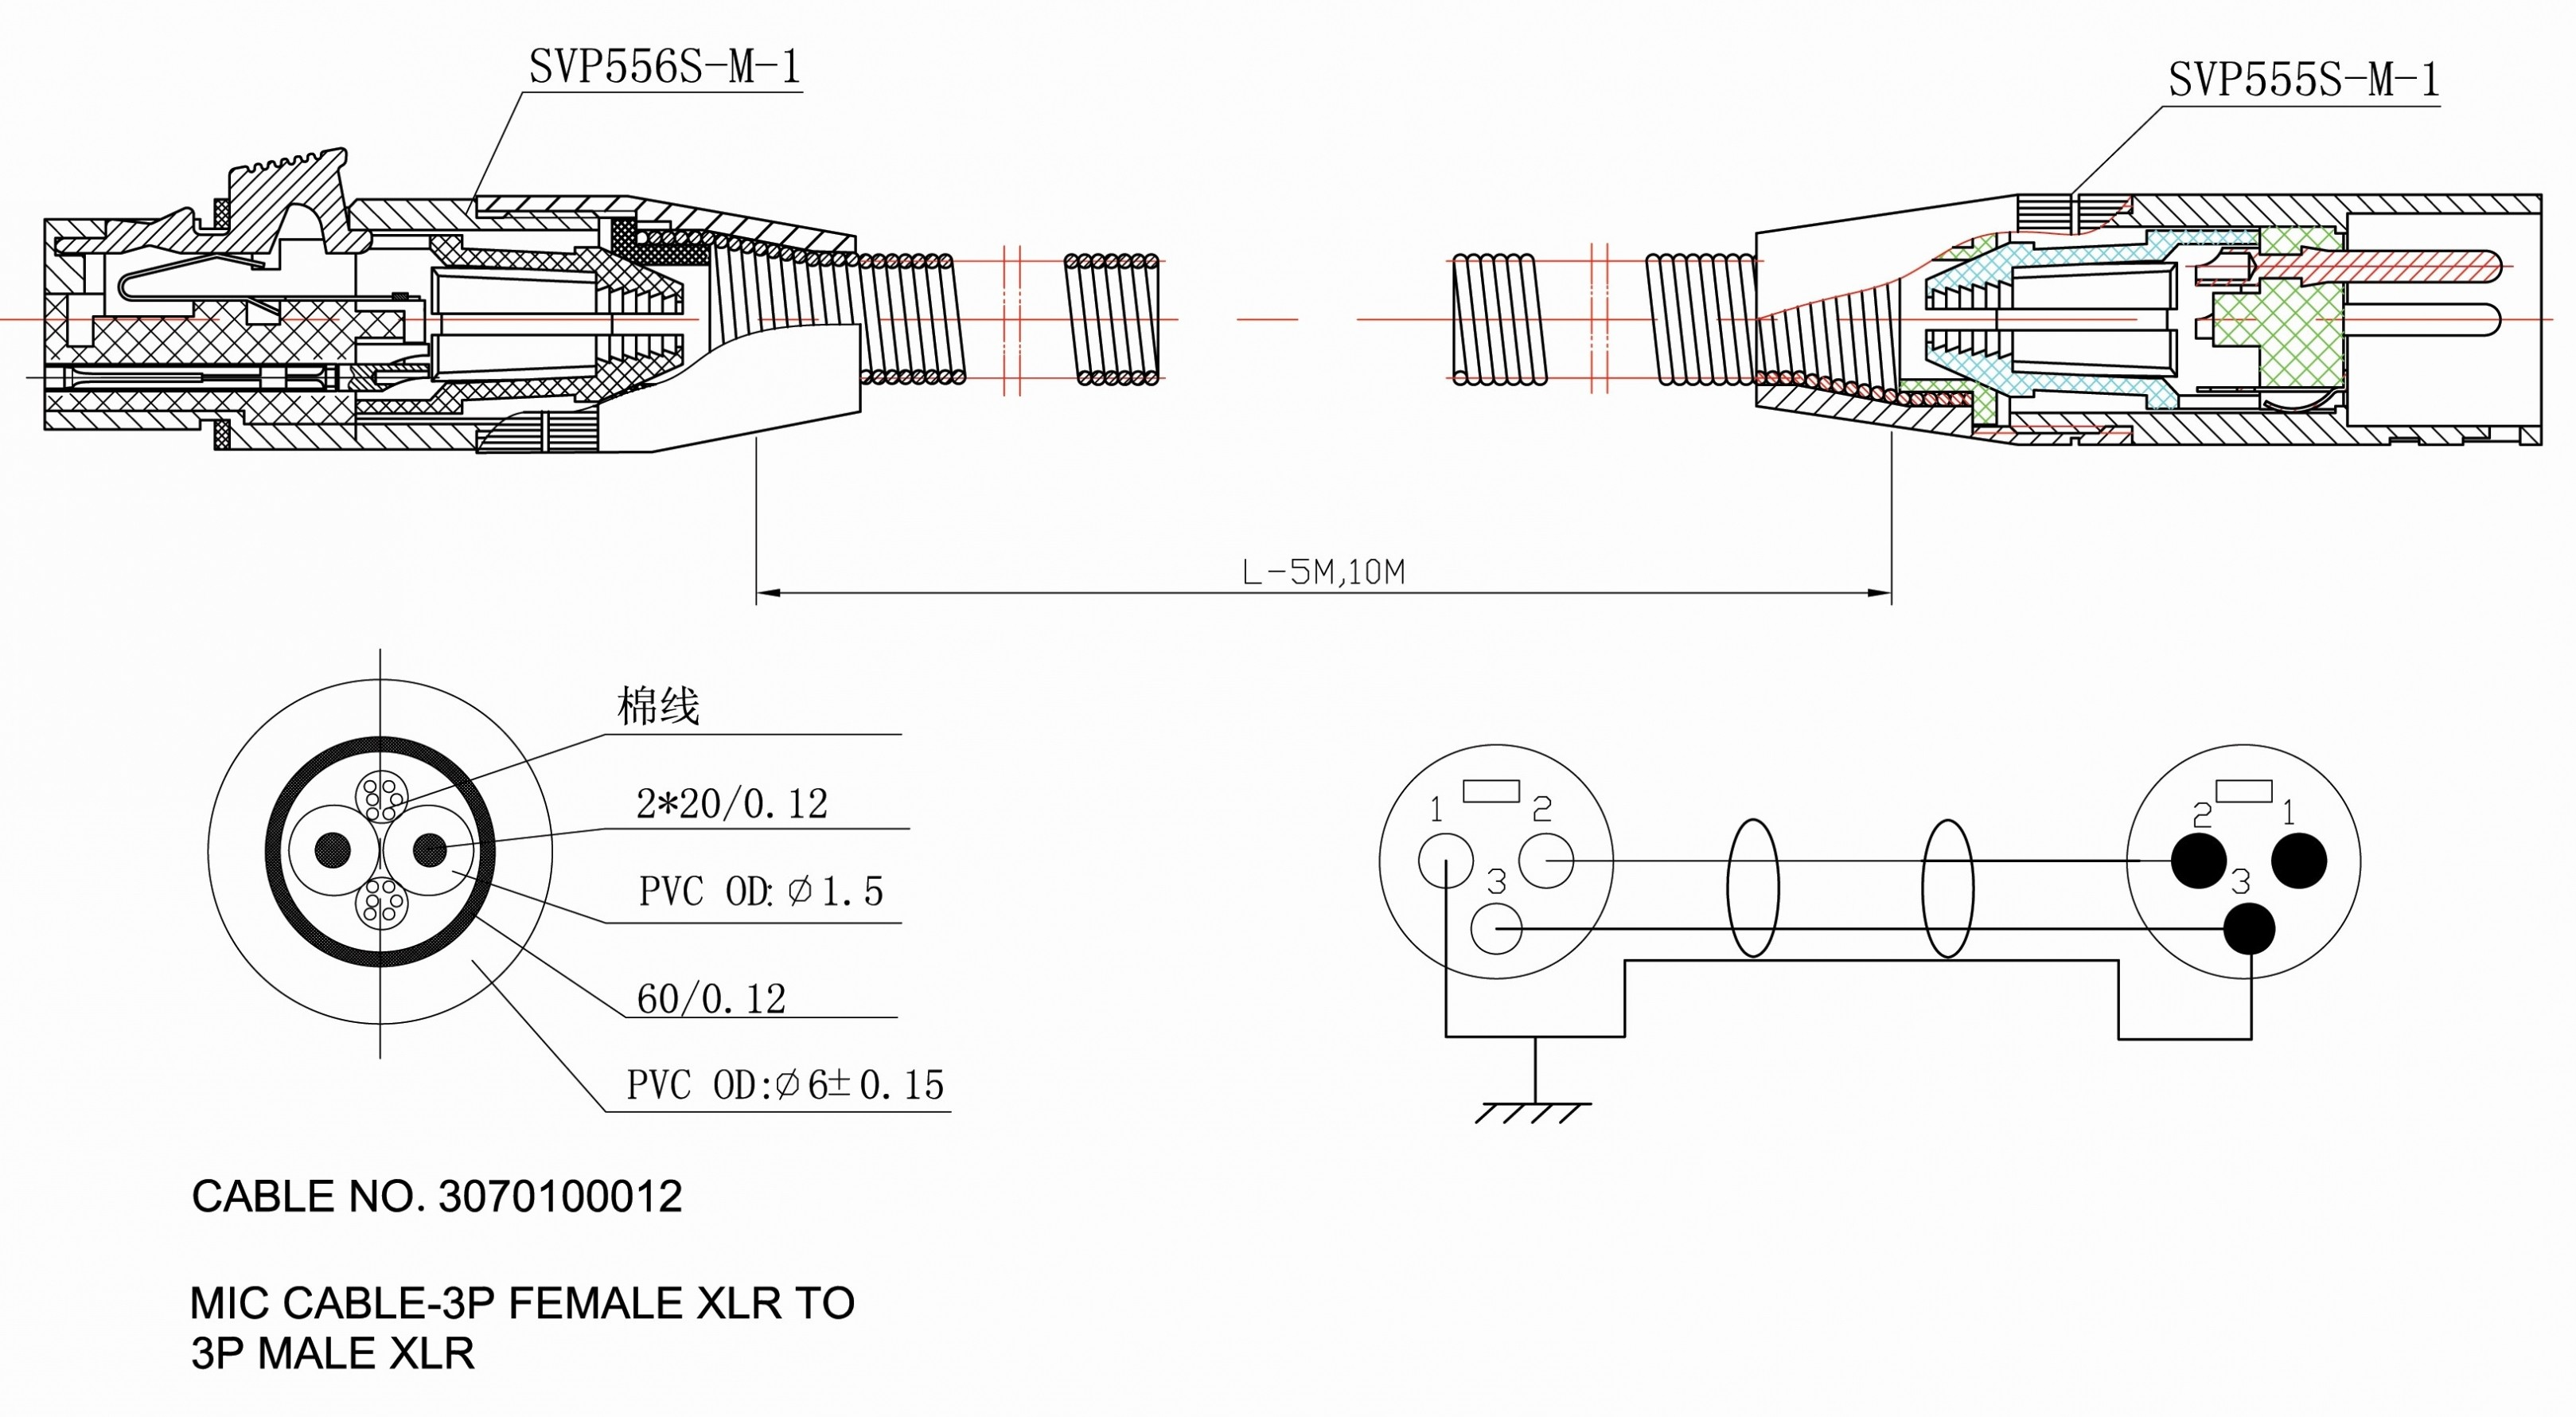 Car Engine Diagram for Dummies Brake Light Wiring Diagram Chevy – Electrical Light Wiring Diagram Of Car Engine Diagram for Dummies